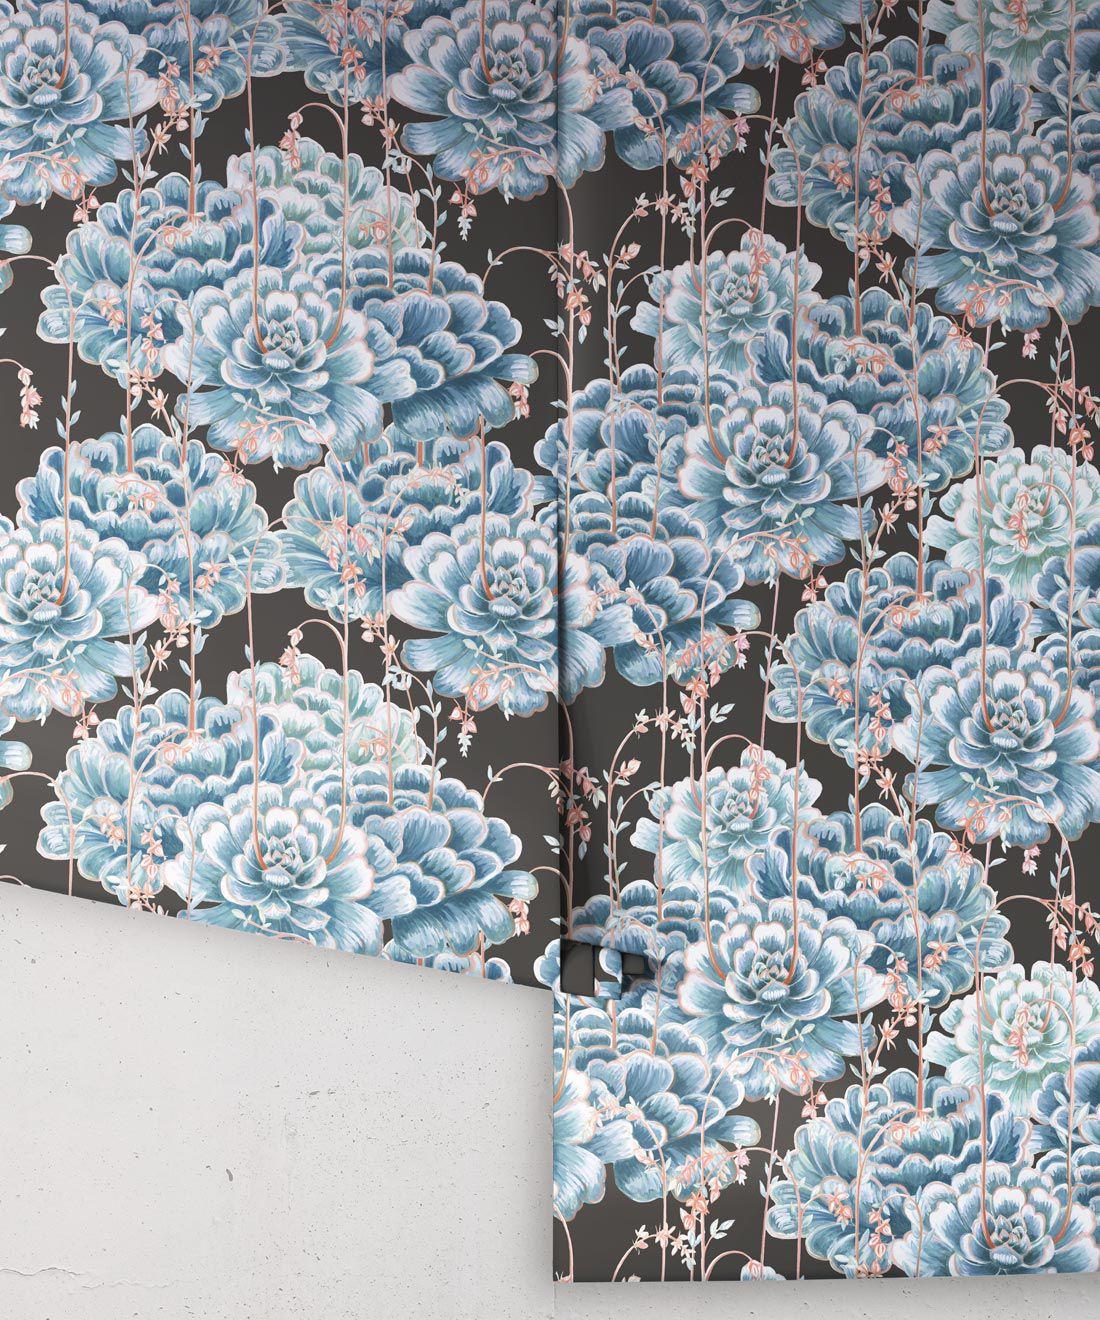 Succulents Wallpaper Blue Charcoal • Cactus Wallpaper • Desert Wallpaper Rolls on black background